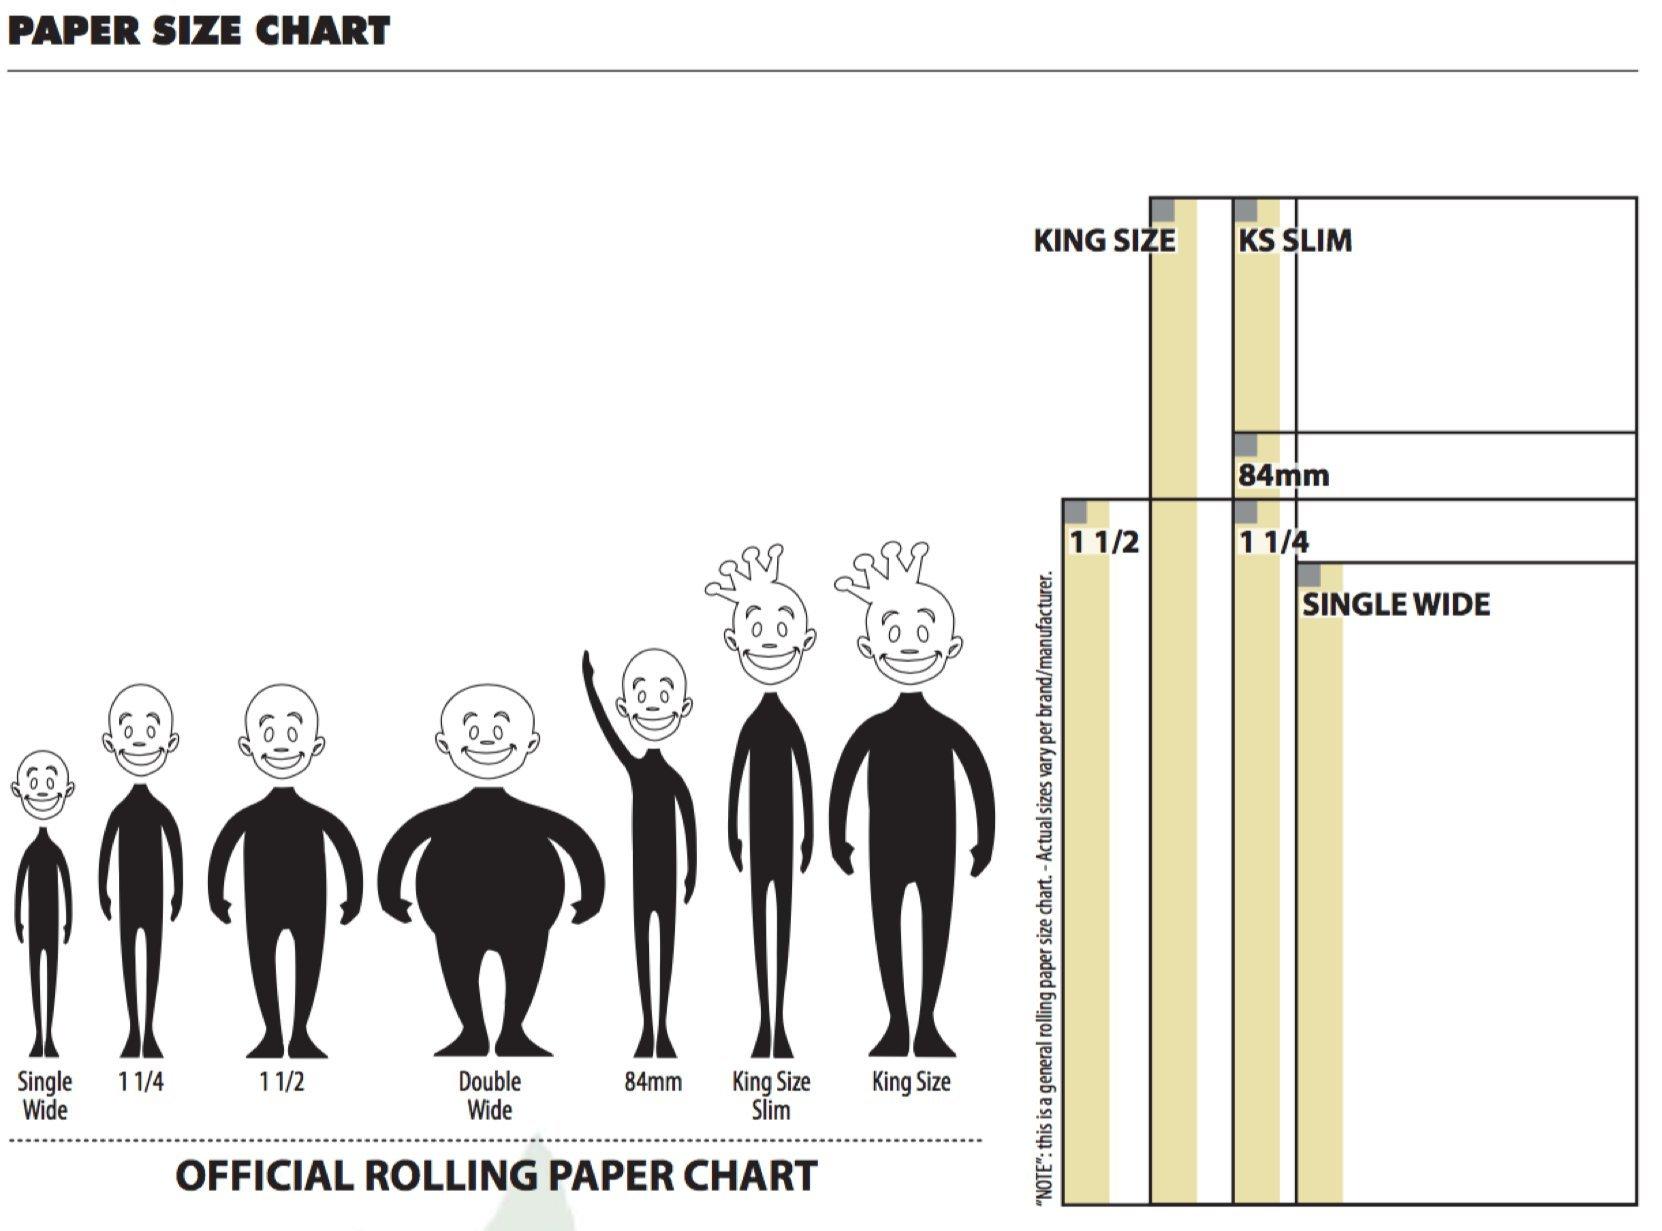 RAW Organic Hemp Natural Unrefined Rolling Paper 70mm Single Wide Size (6 Packs)